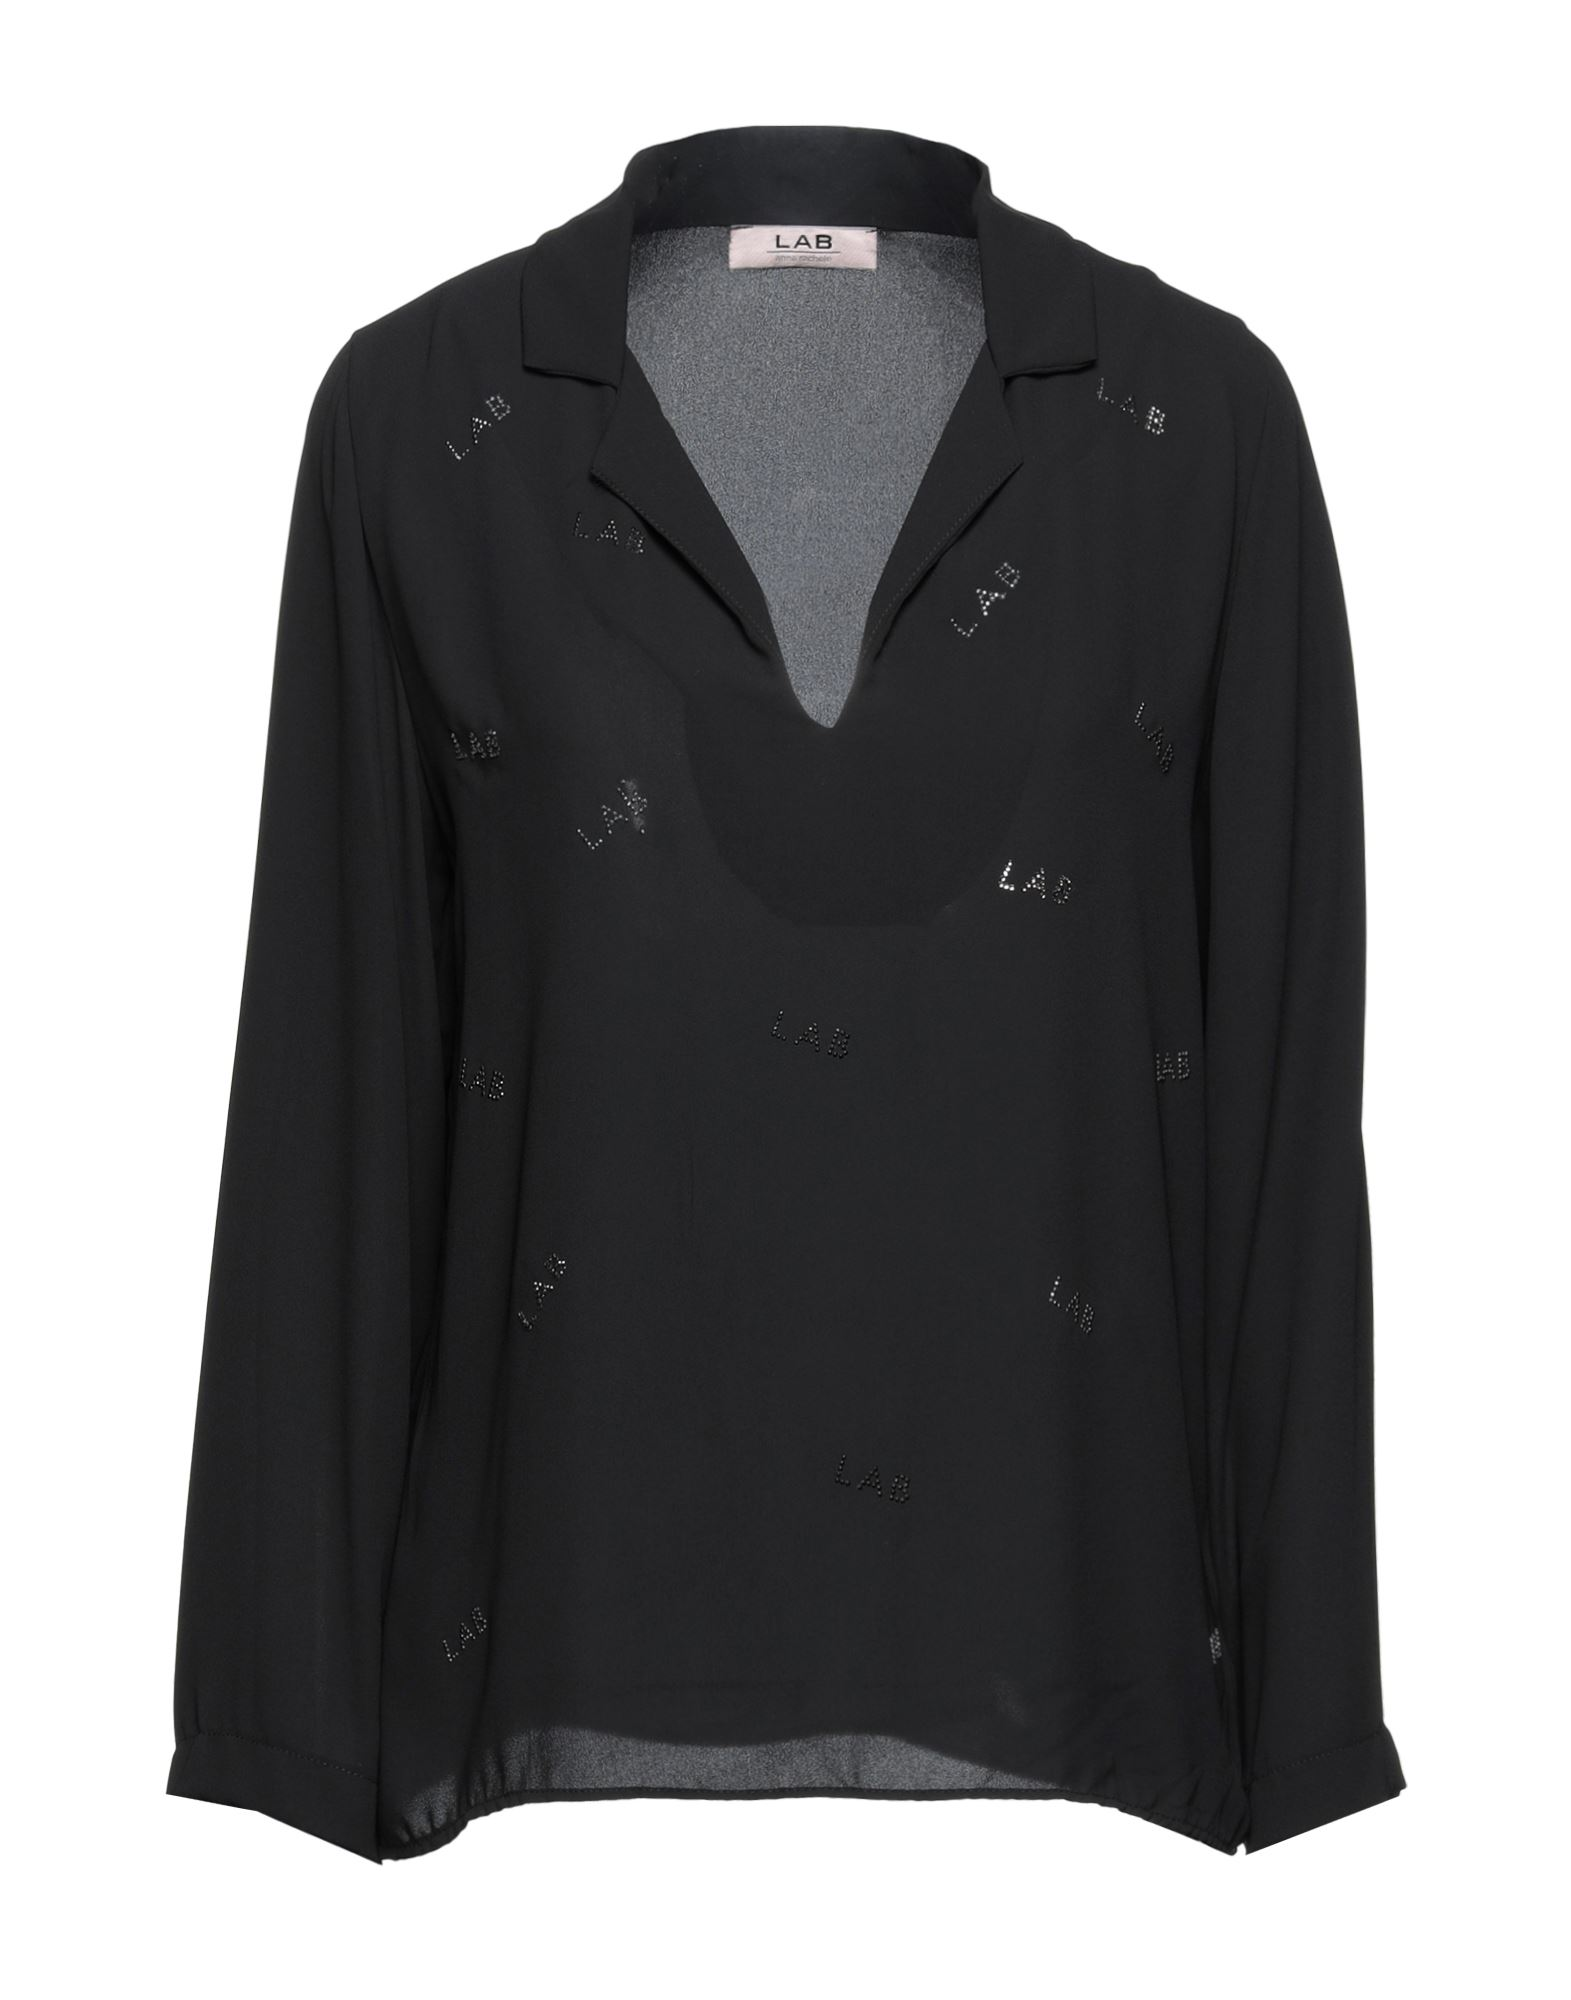 LAB ANNA RACHELE Блузка 6 5 lab блузка